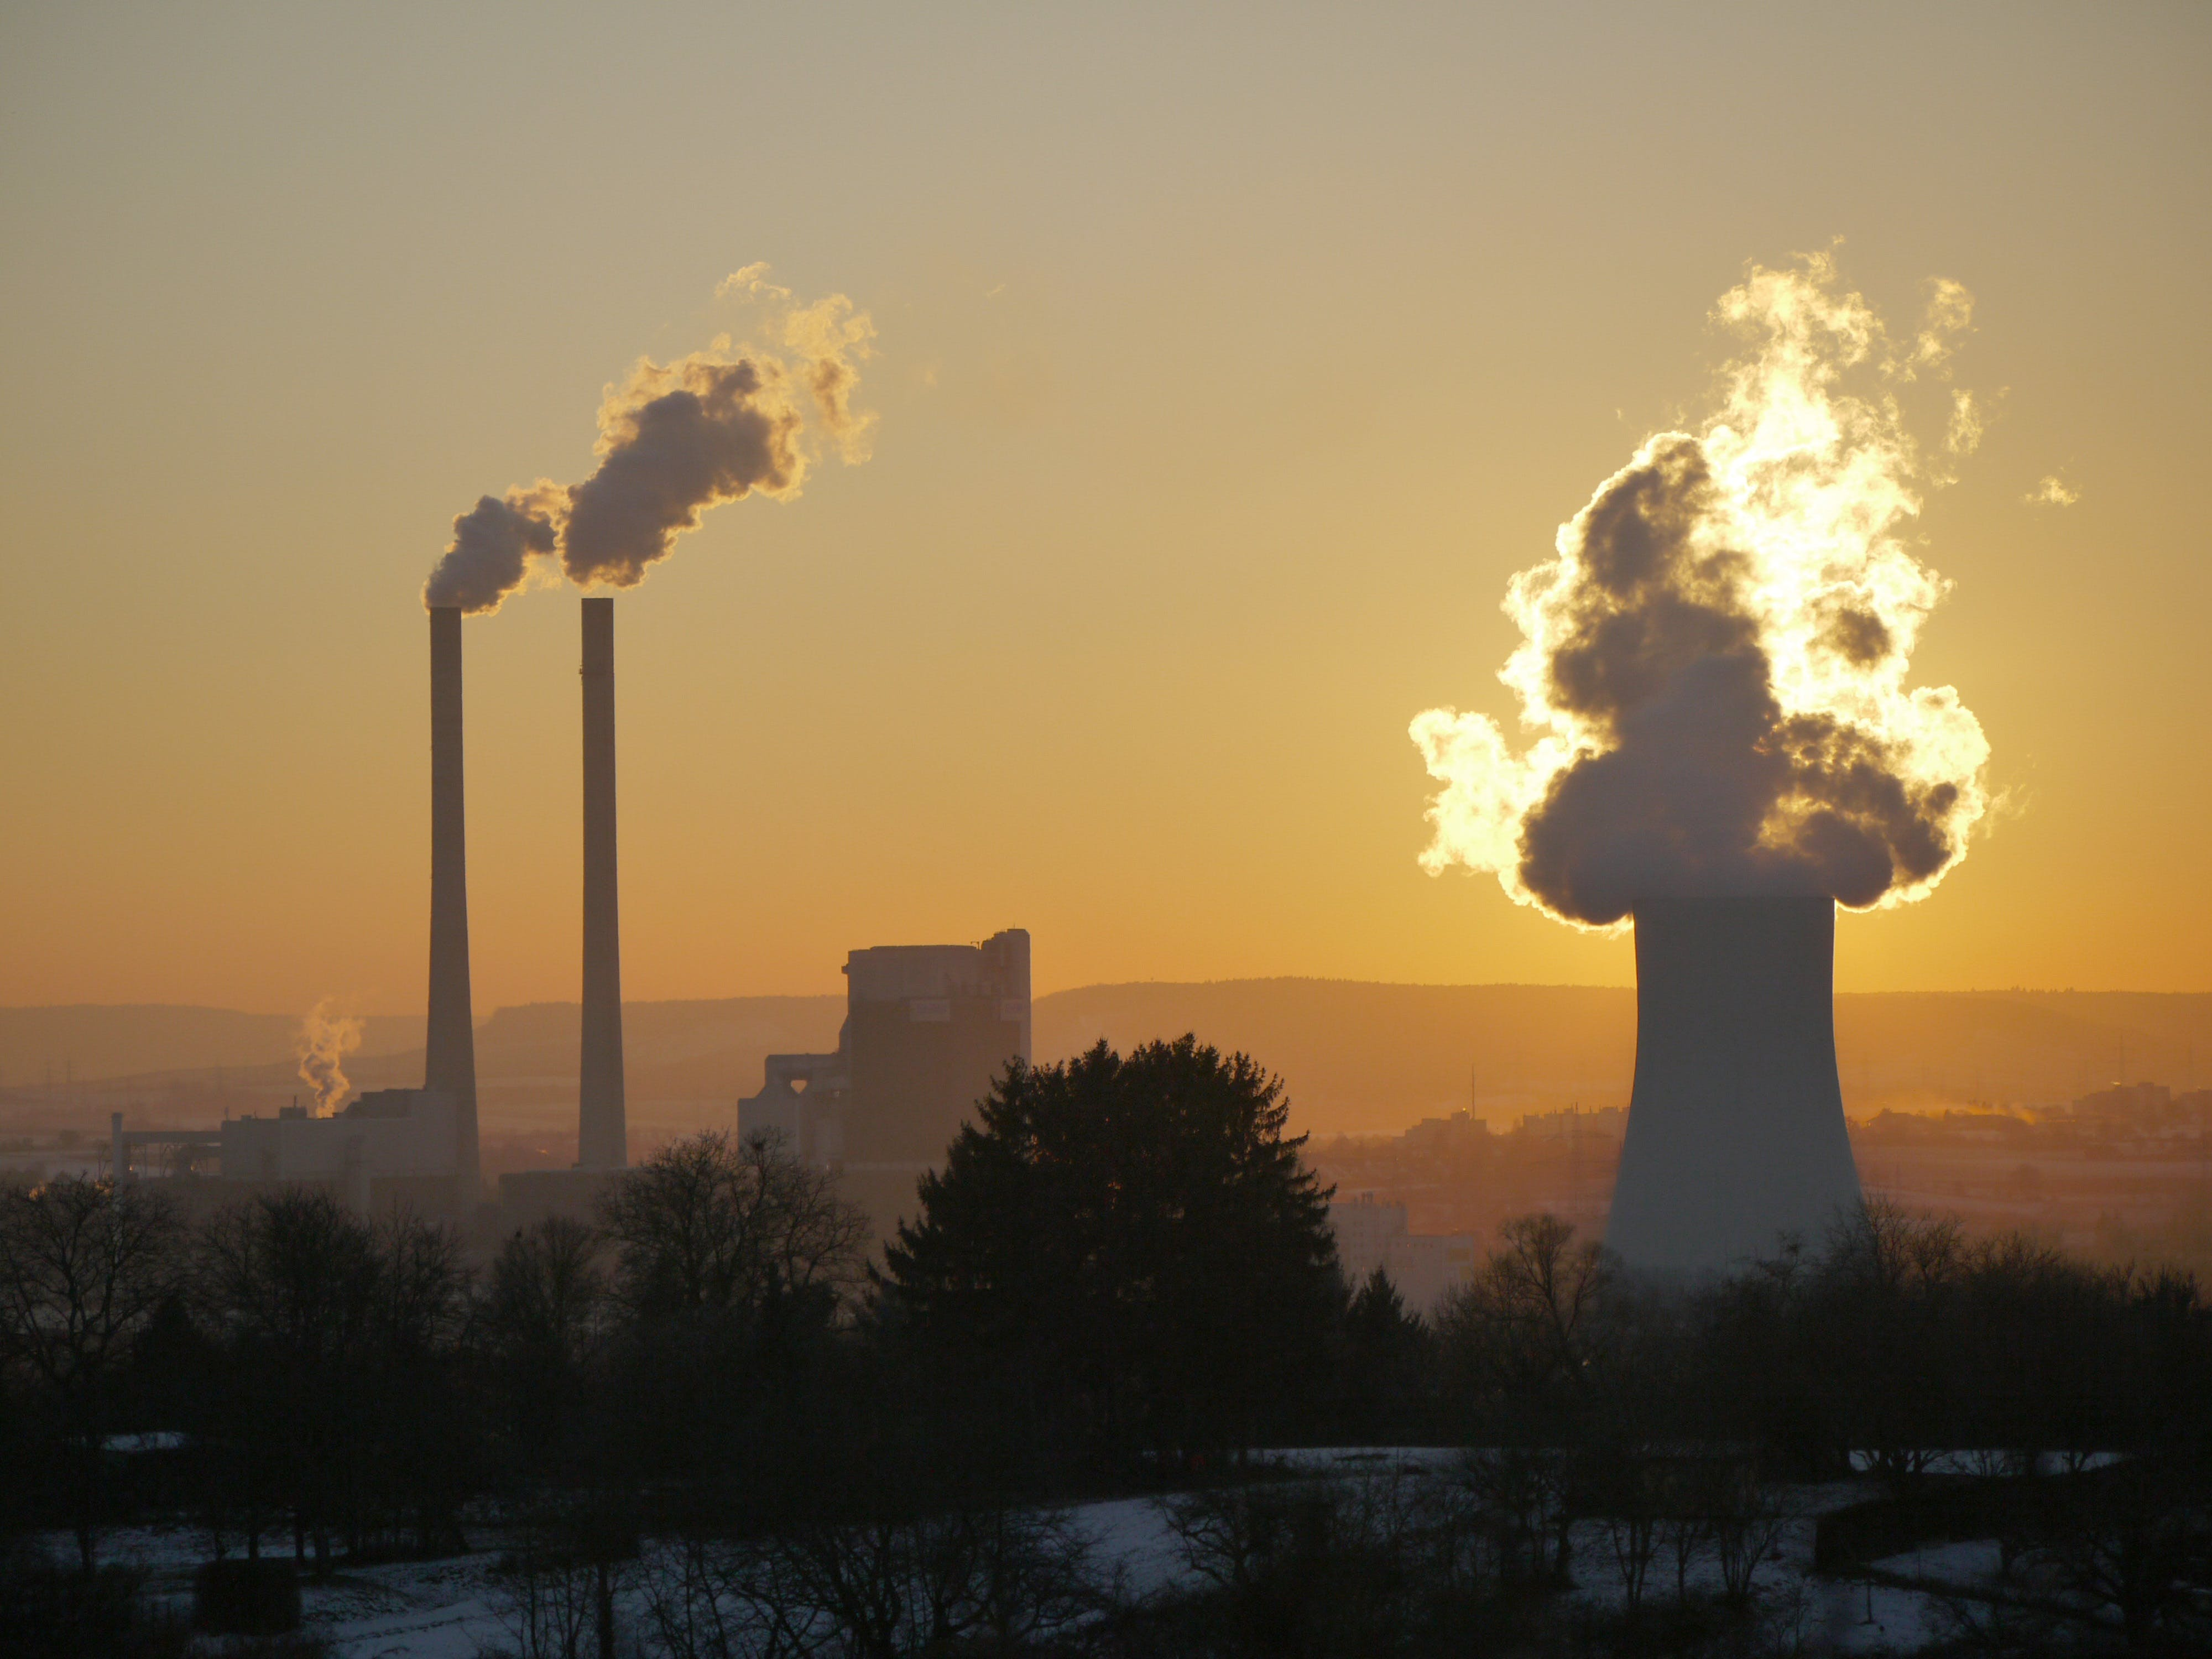 Free stock photo of industry, smog, factory, smoke